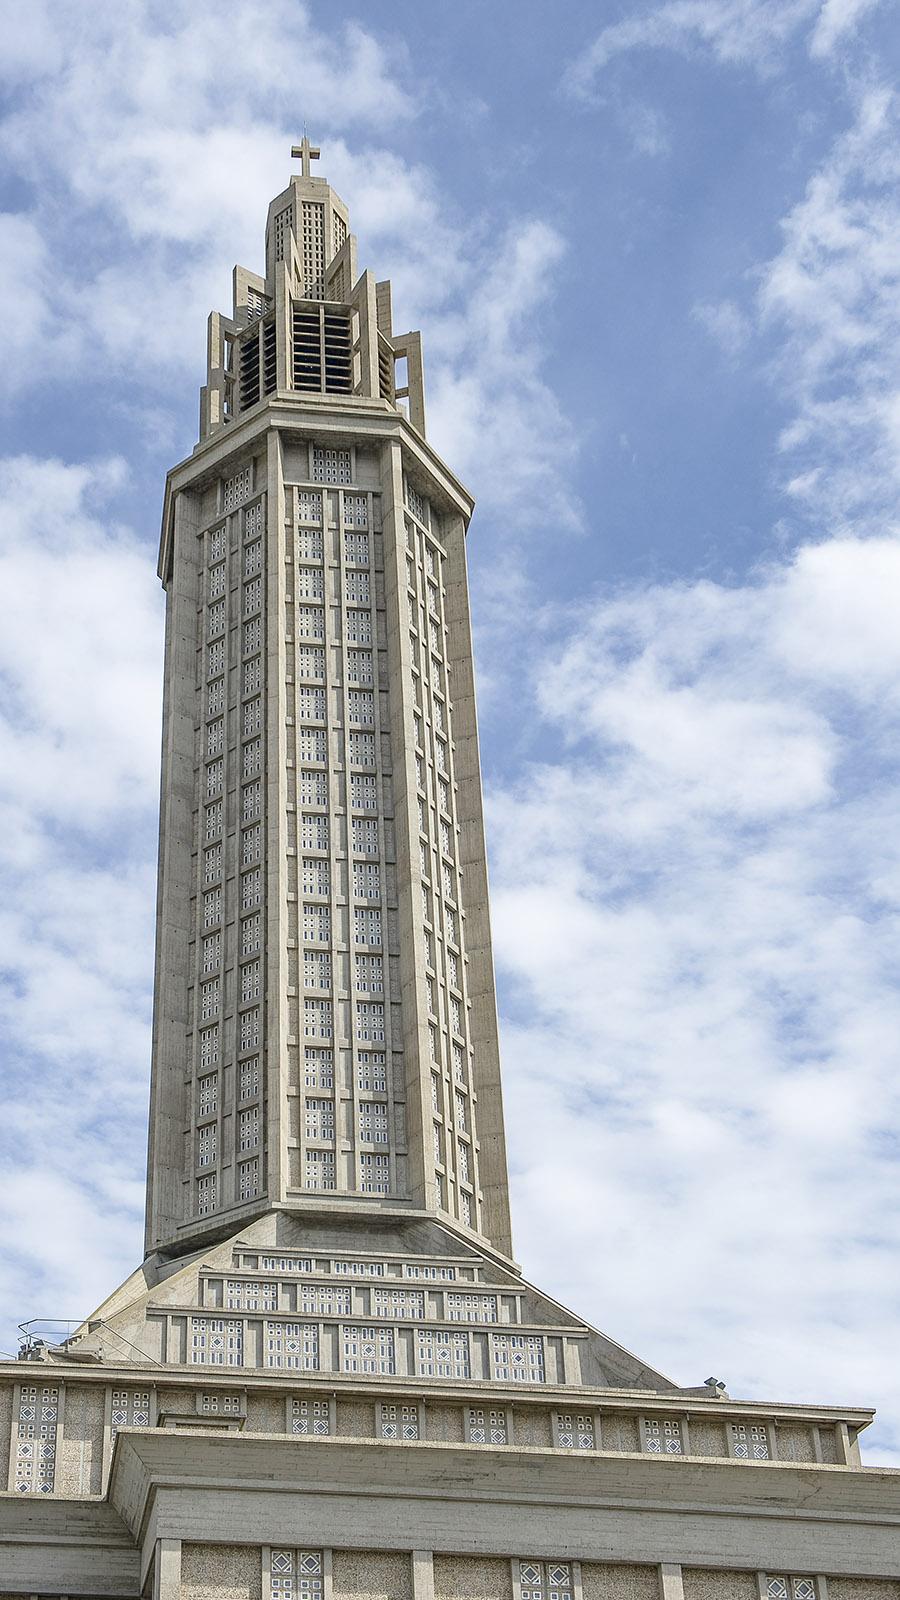 Der 110 m hohe der Église Saint-Joseph von Le Havre. Foto: Hilke Maunder